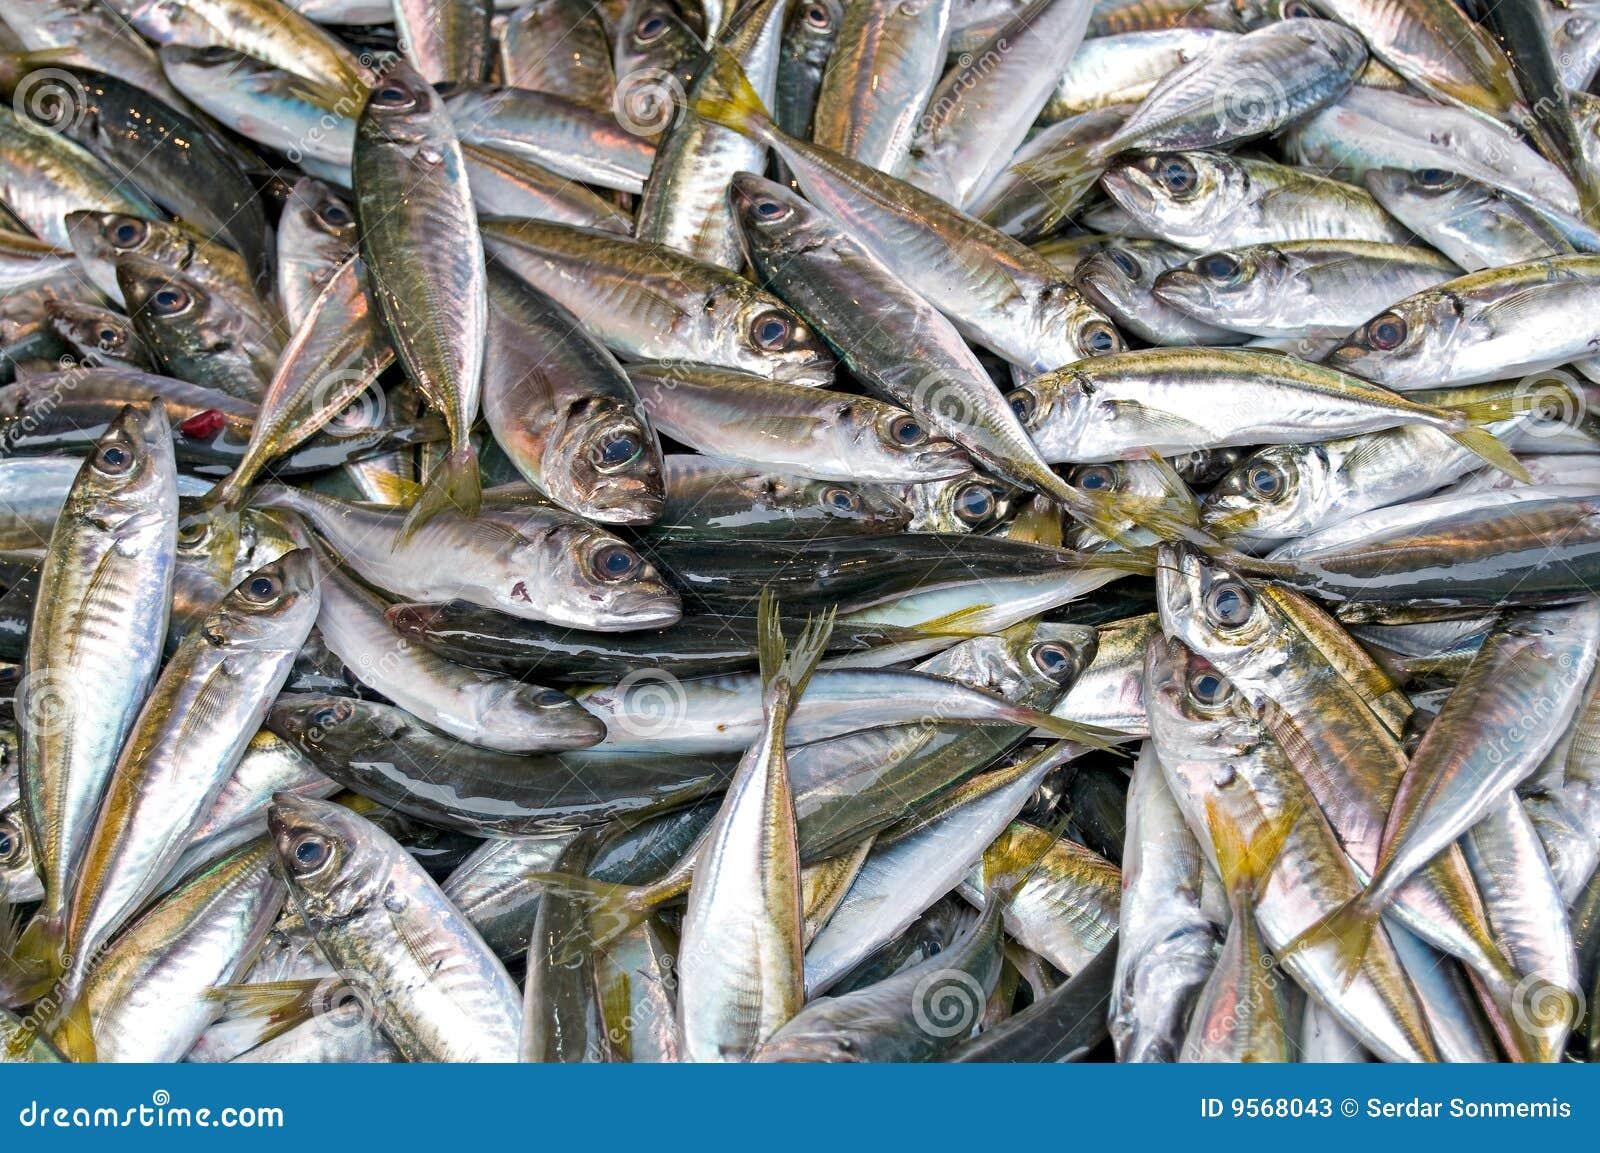 Fresh fish at the market stock photos image 9568043 for Bud s fish market